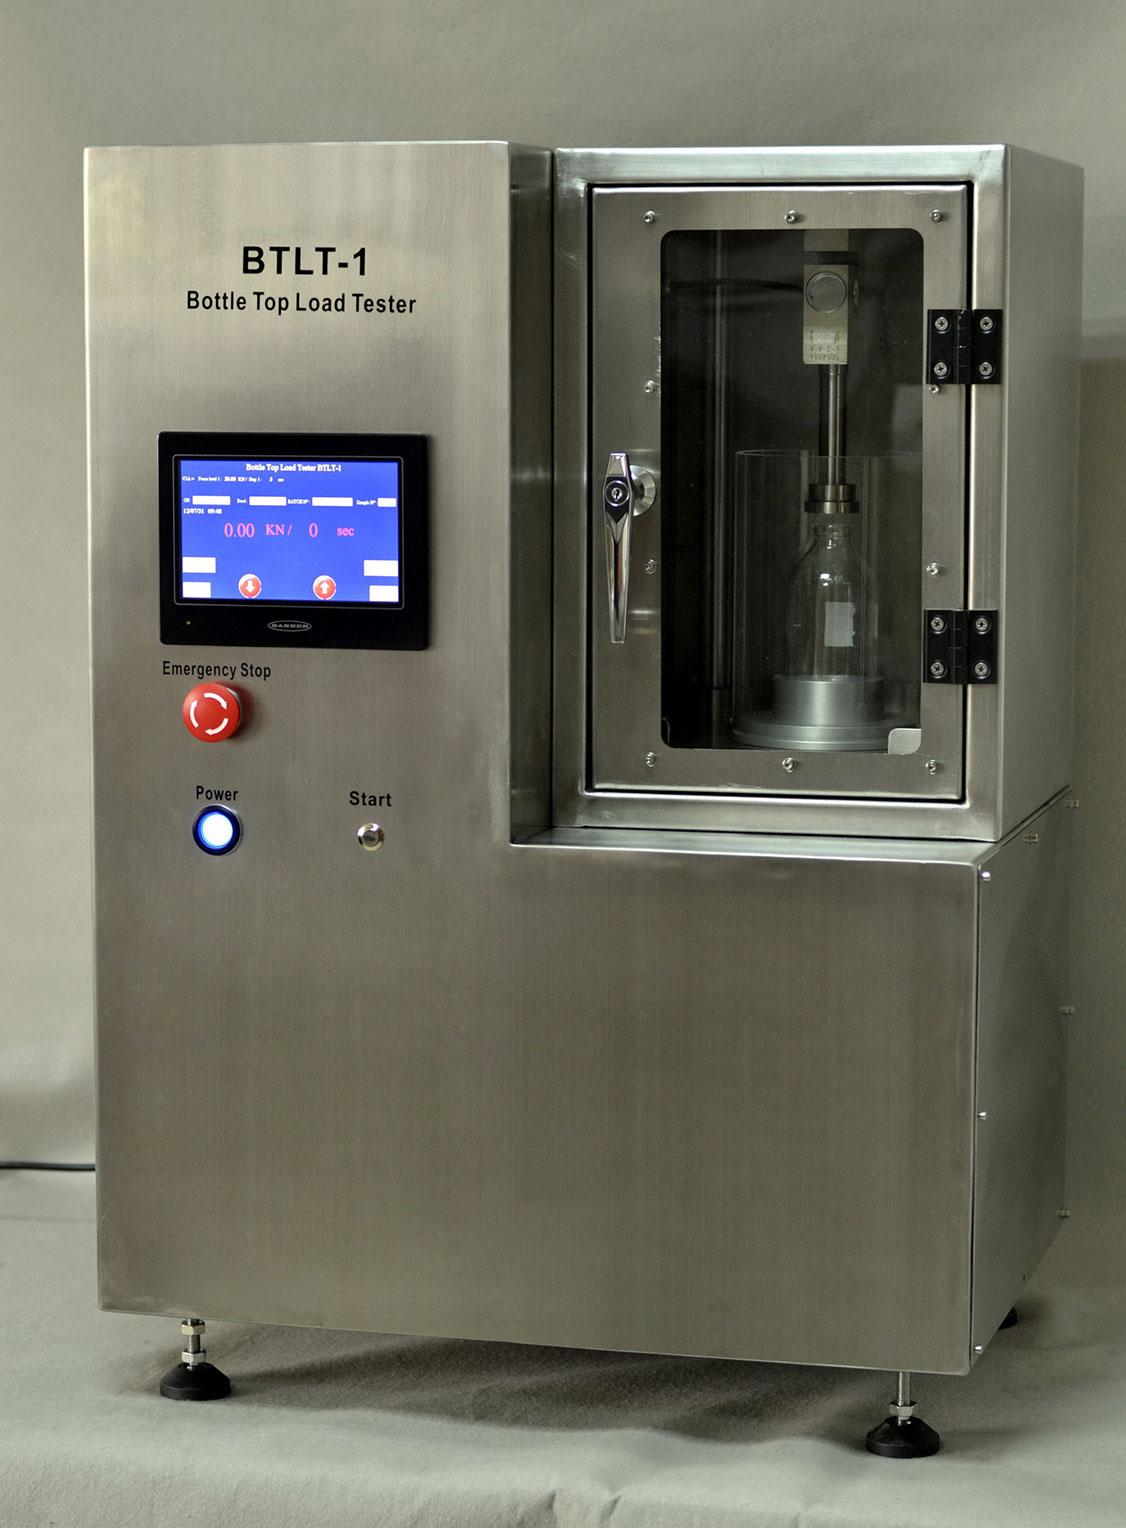 Btlt 1 Glass Bottle Top Load Tester Maximum Top Load